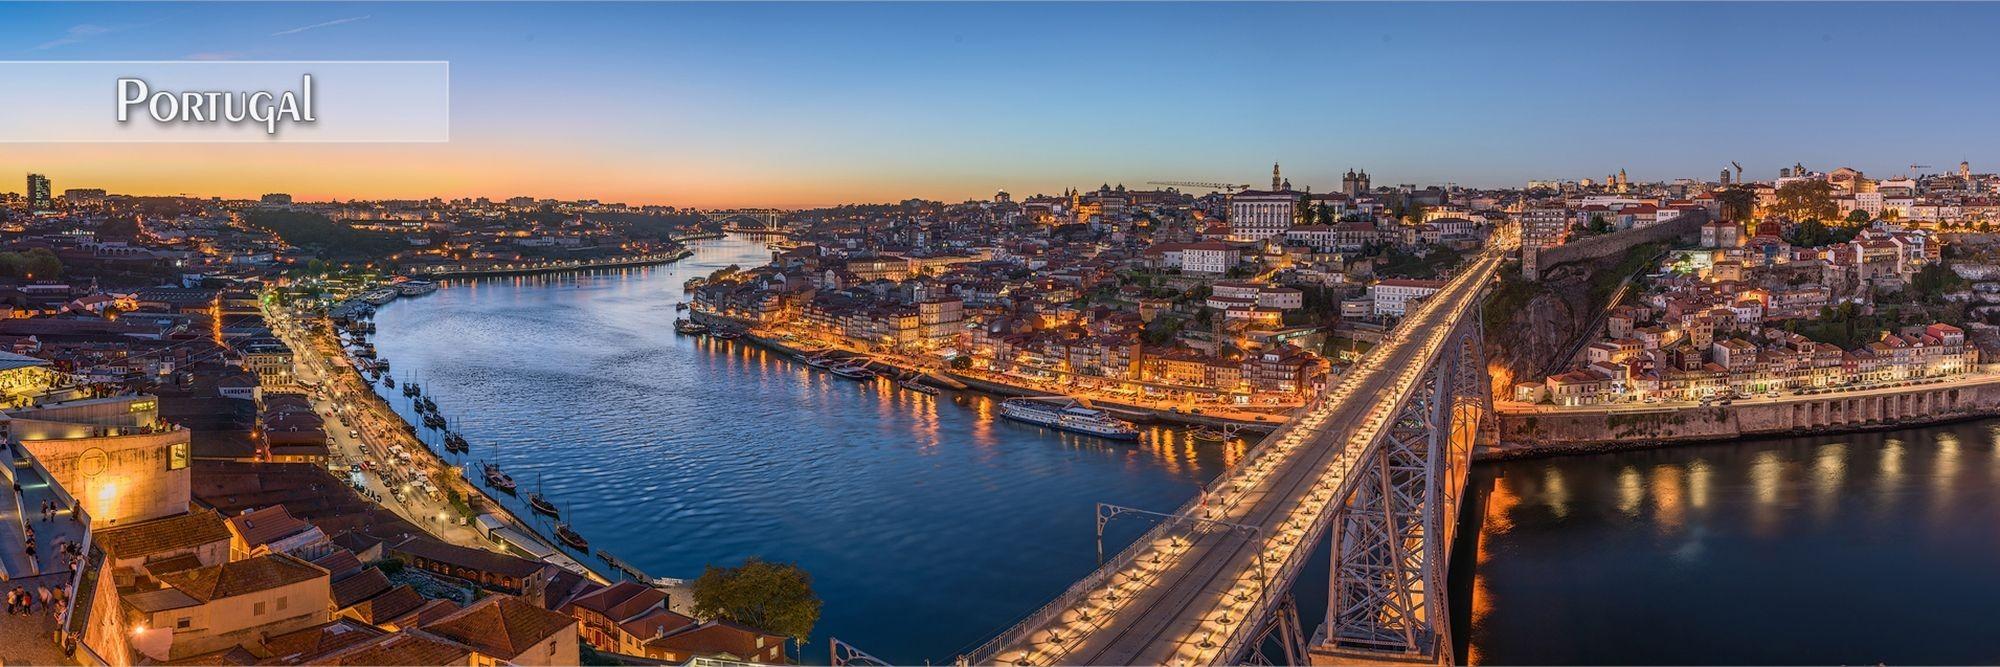 FineArt & Panoramafotografien aus Portugal